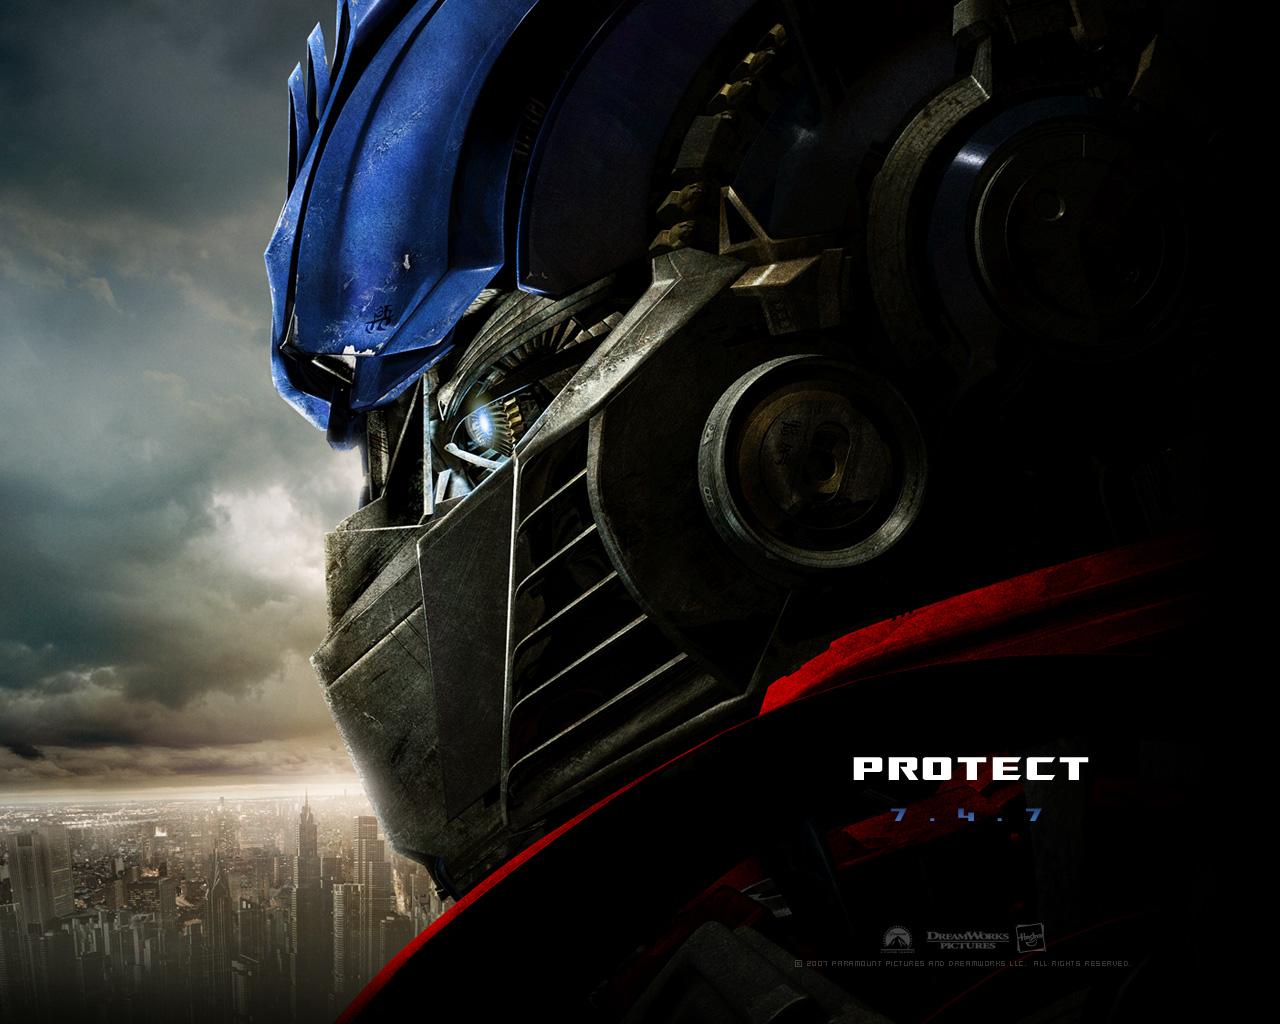 http://2.bp.blogspot.com/-UaeKMH0ud7k/UW9iUtm-wXI/AAAAAAAAroM/Wpx8NkakVCU/s1600/Transformers+wallpaper+(8).jpg